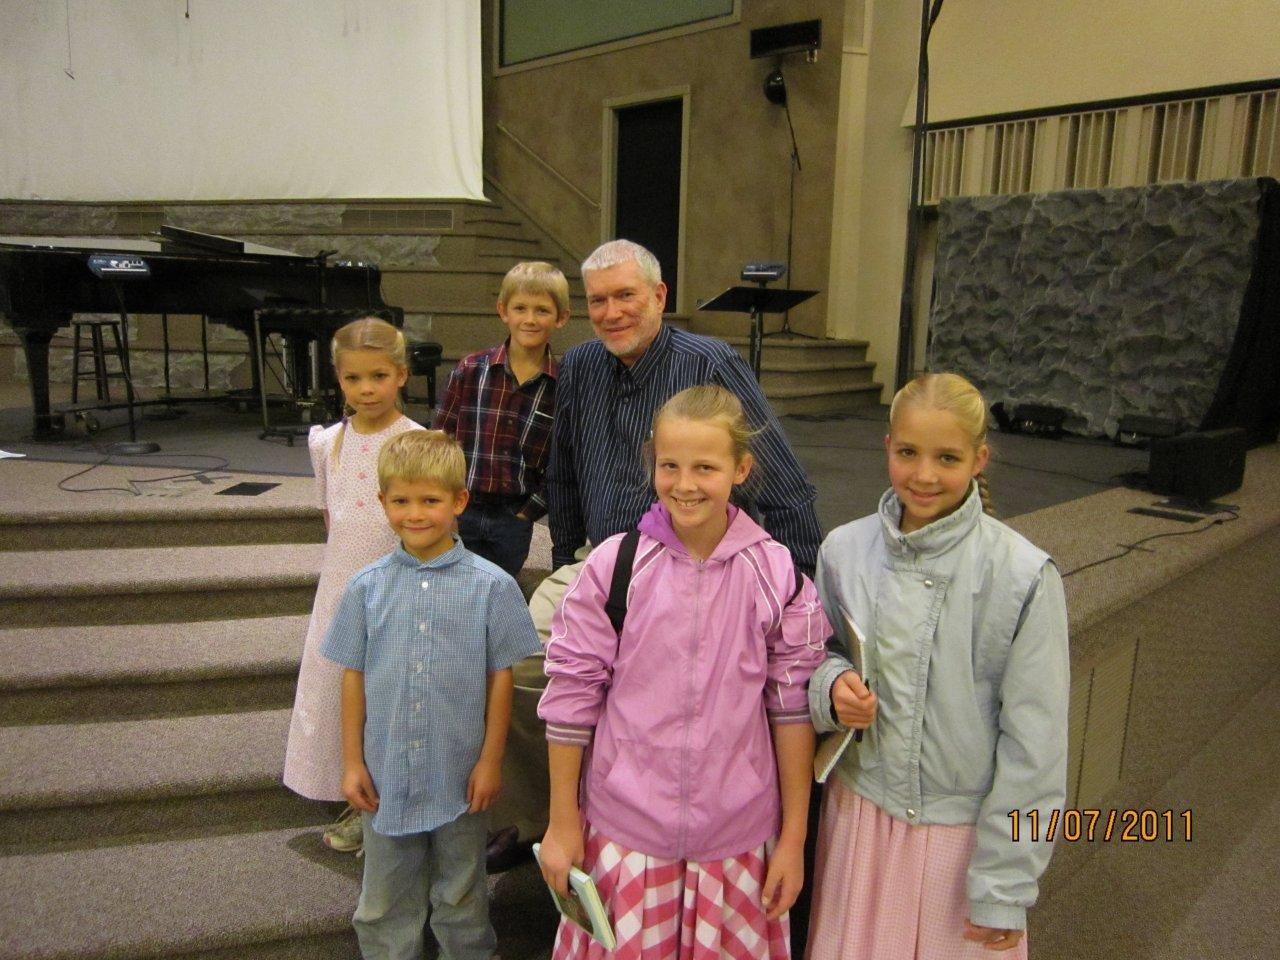 Big Valley Grace Community Church, Modesto, CA